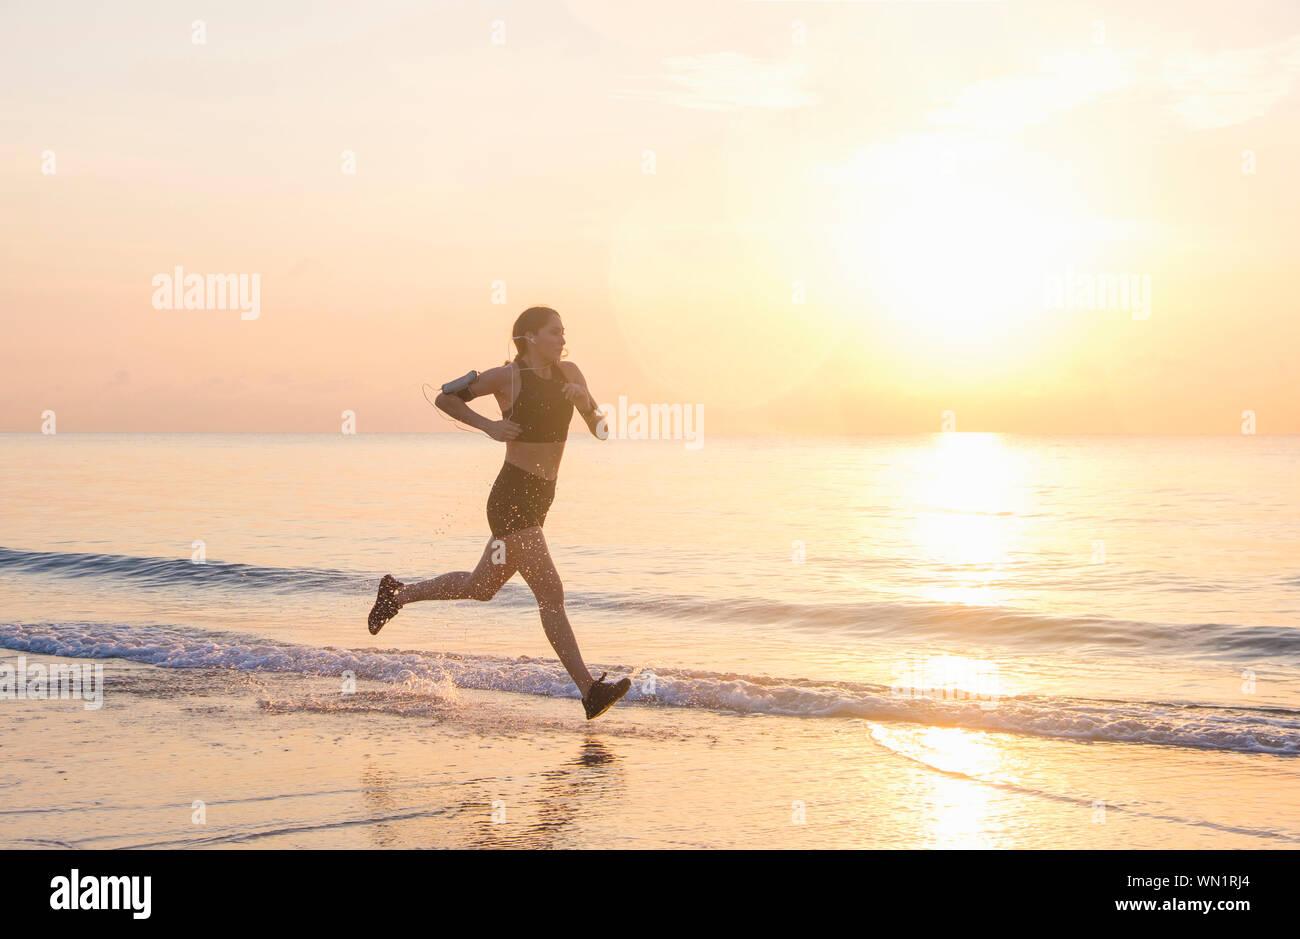 Woman jogging on beach at sunset Stock Photo